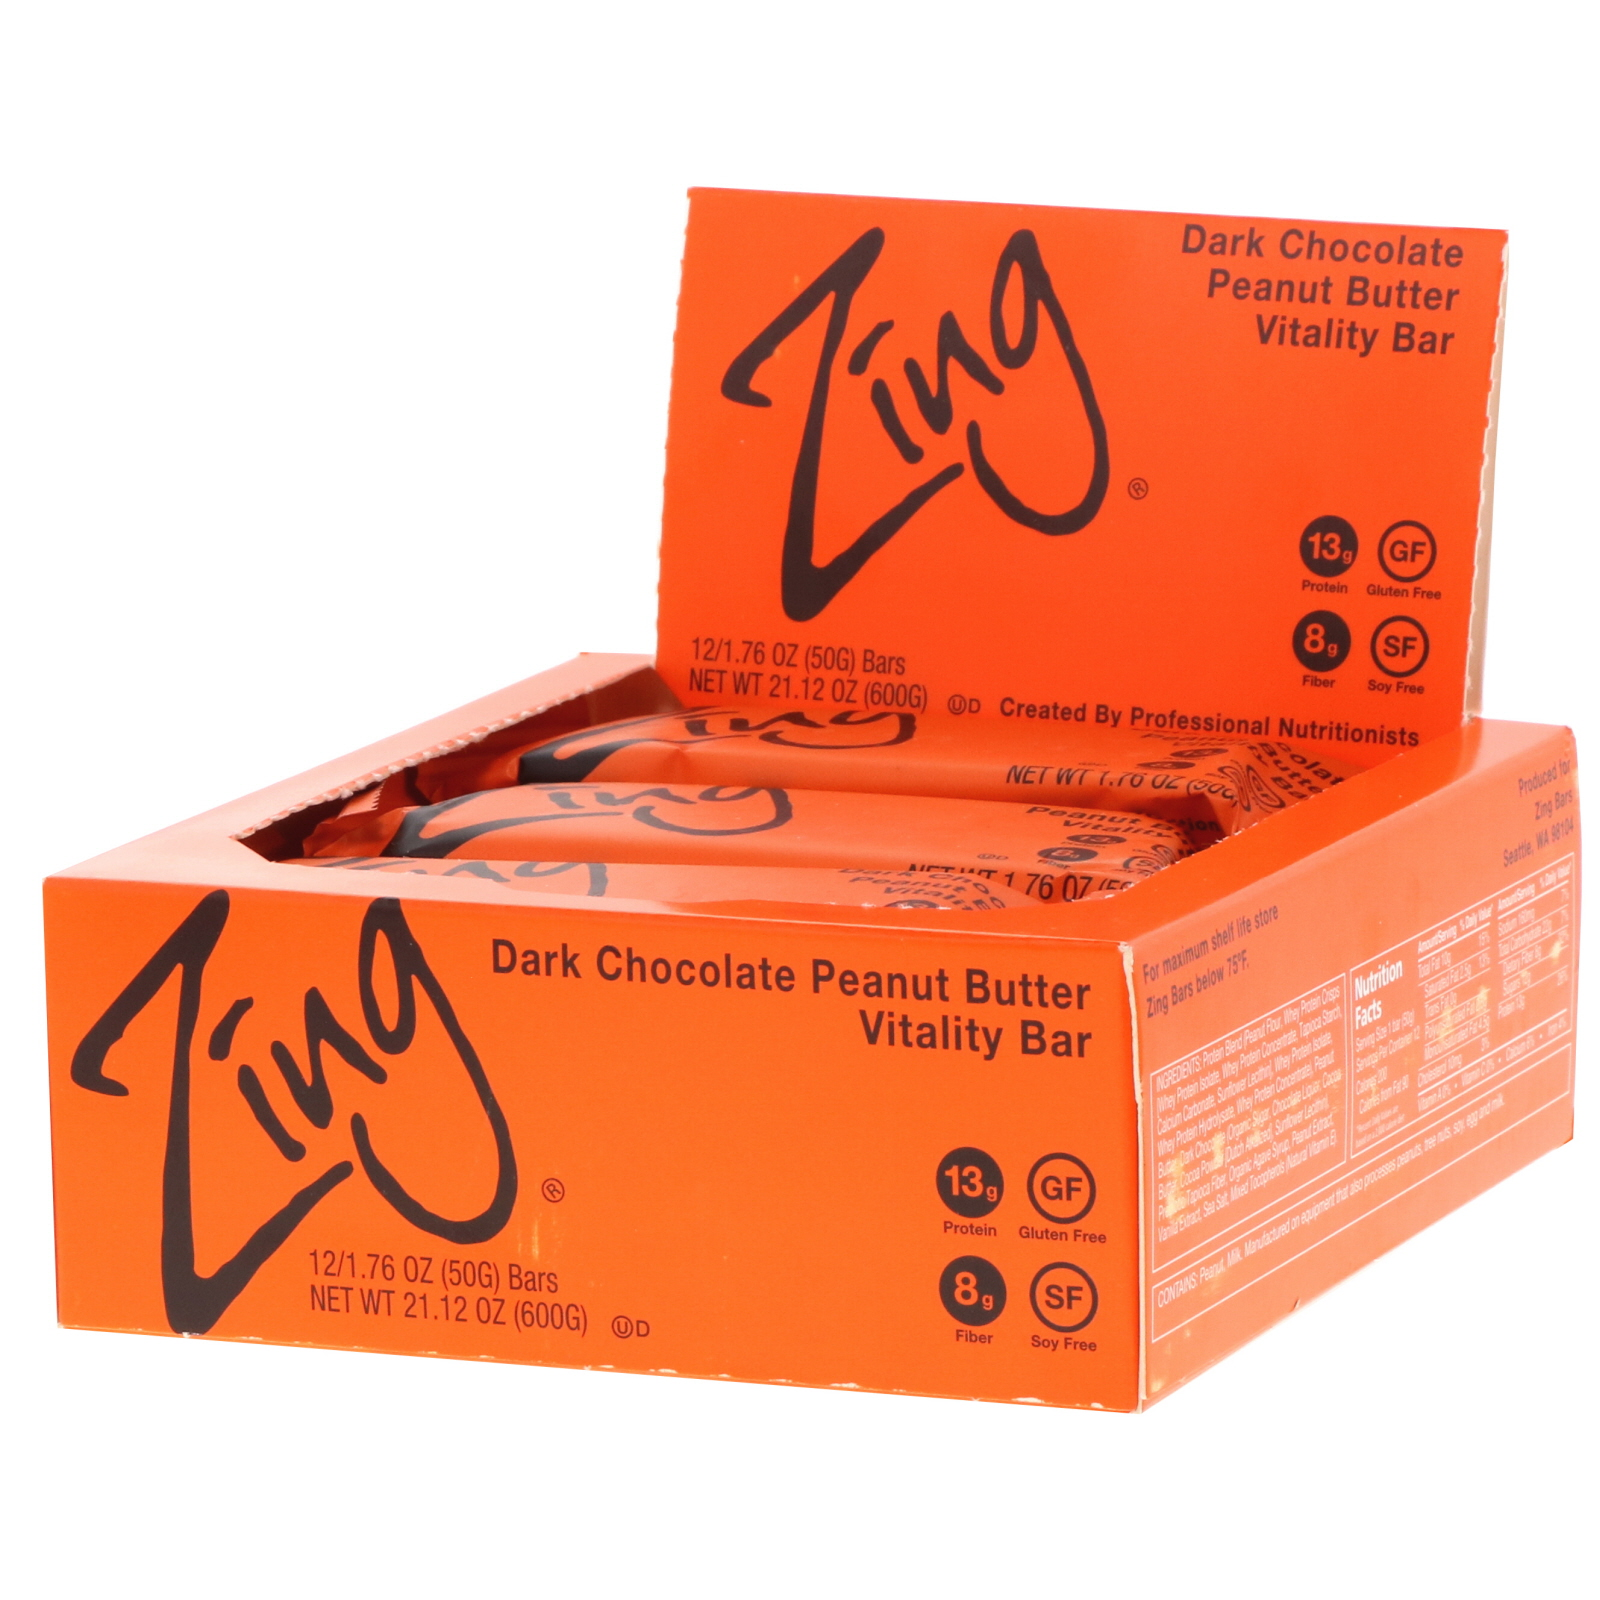 Zing Bars, Vitality Bar, Dark Chocolate